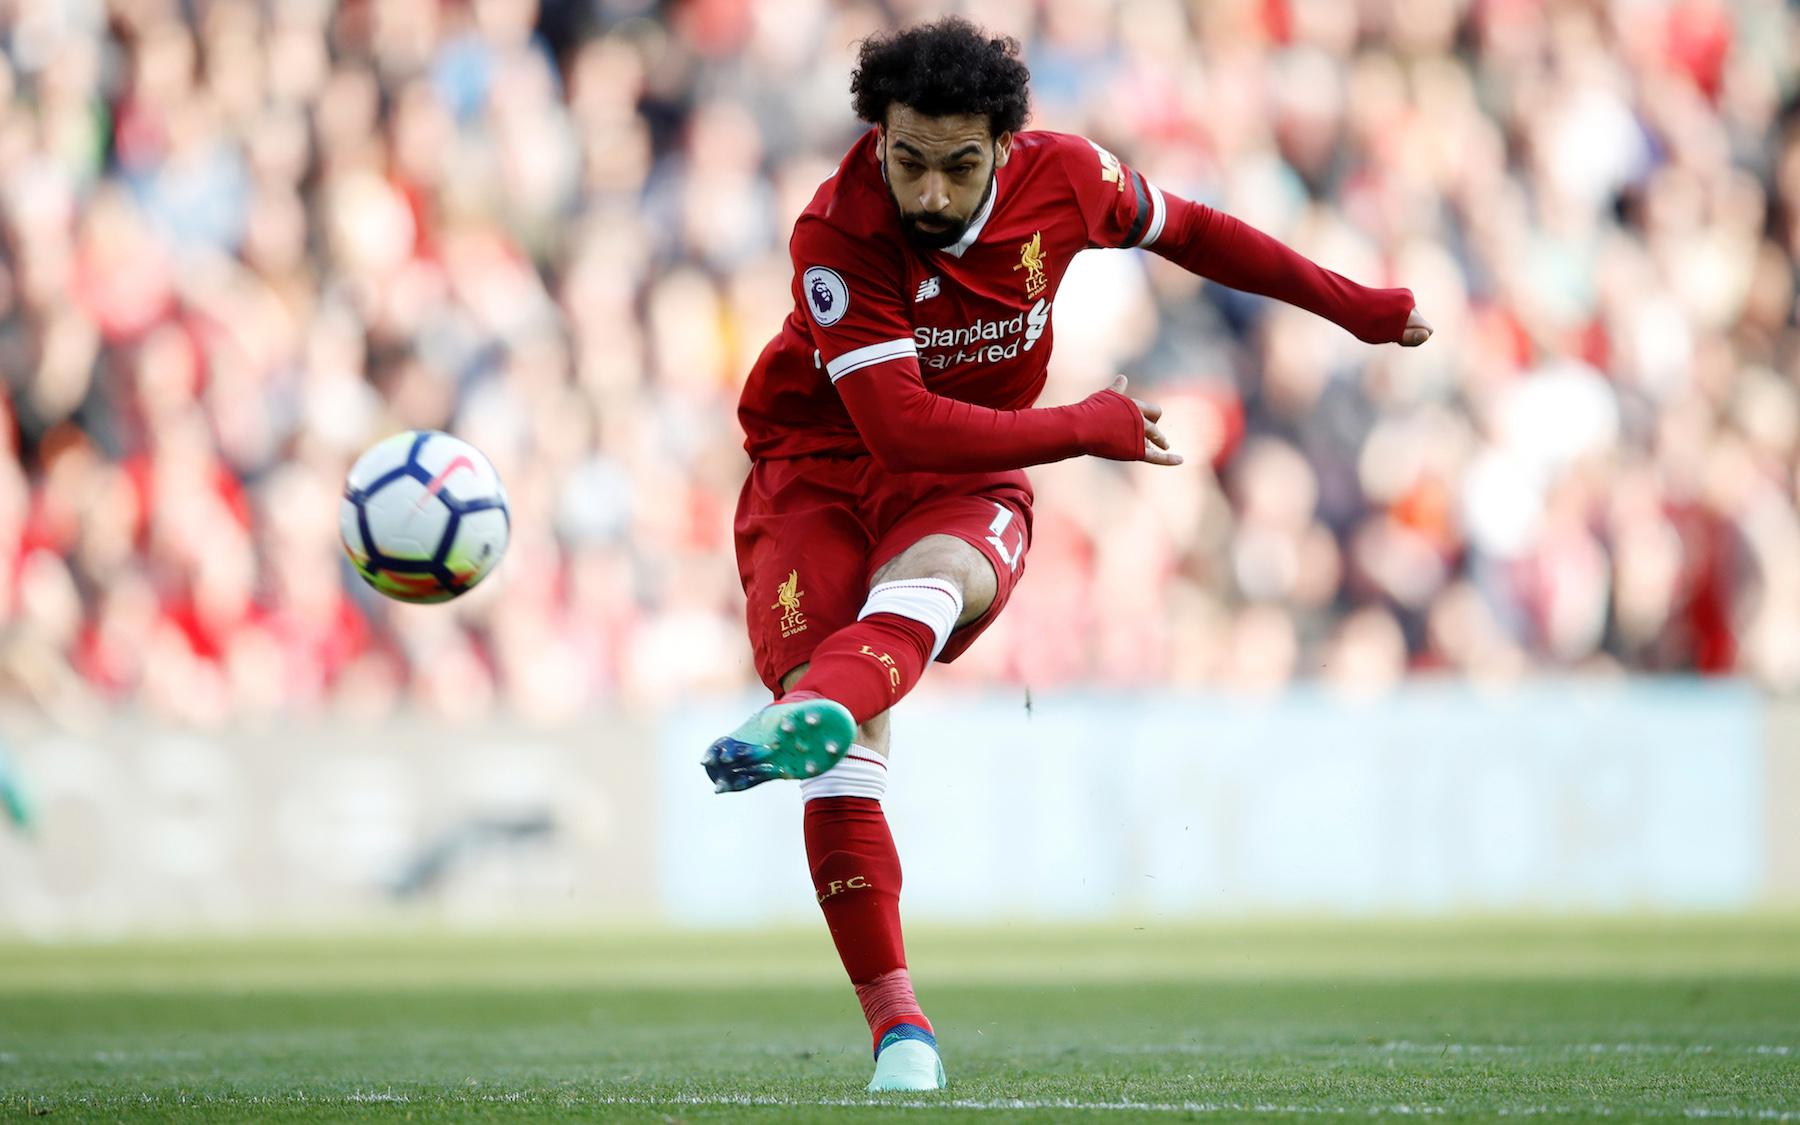 4k-mohamed-salah-free-kick-liverpool-football-stars